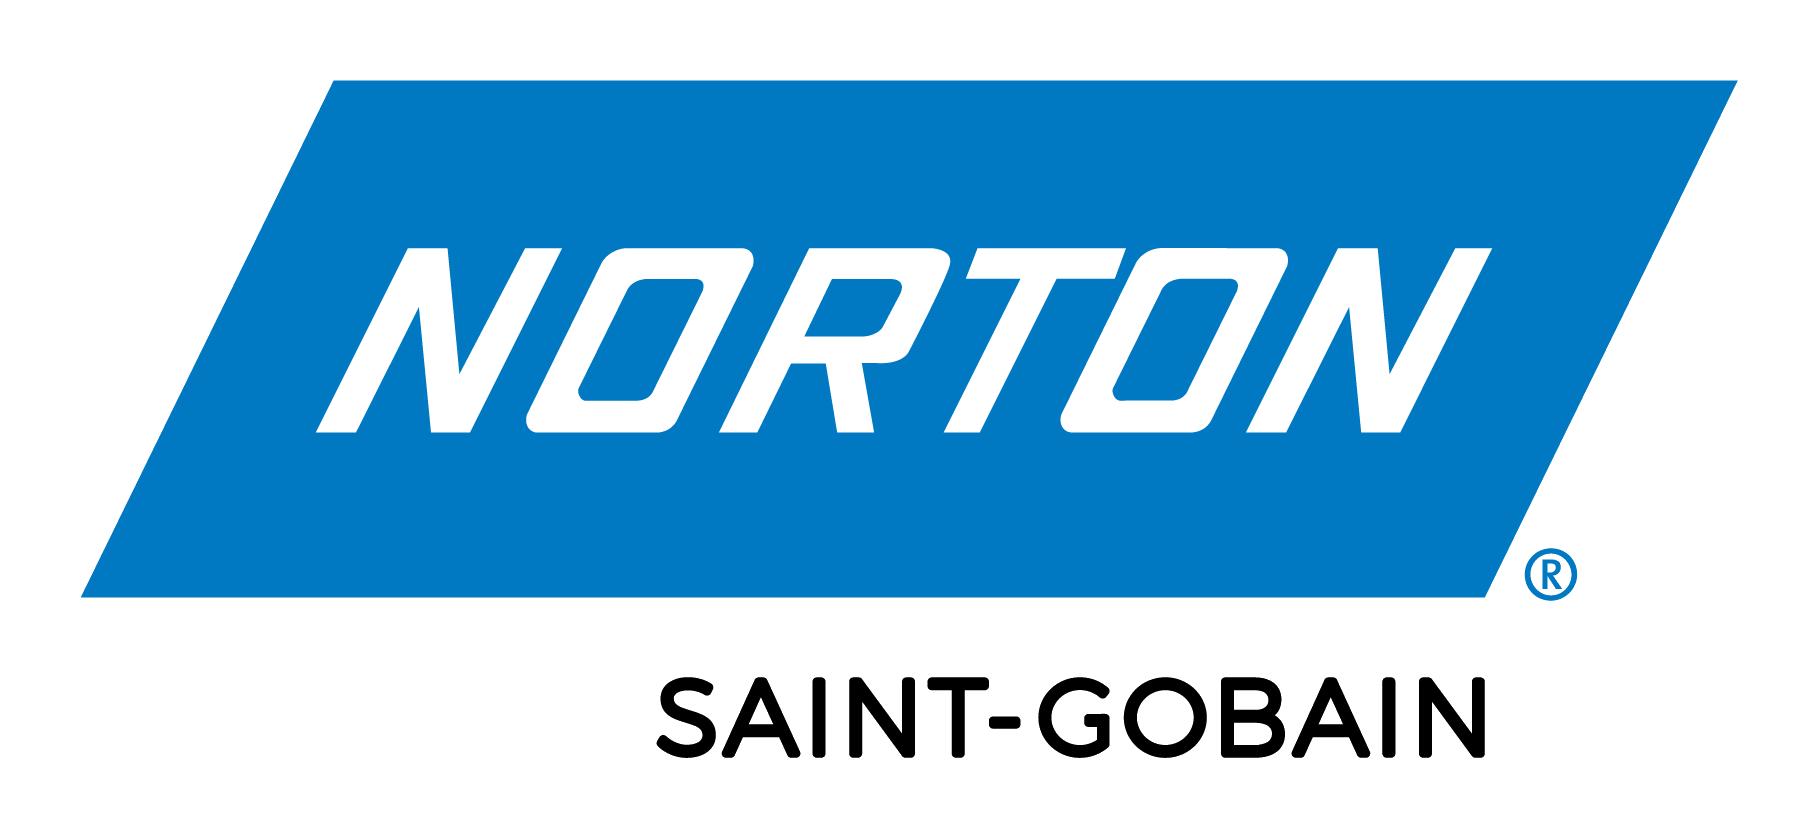 SG_Norton_logo_rgb_13